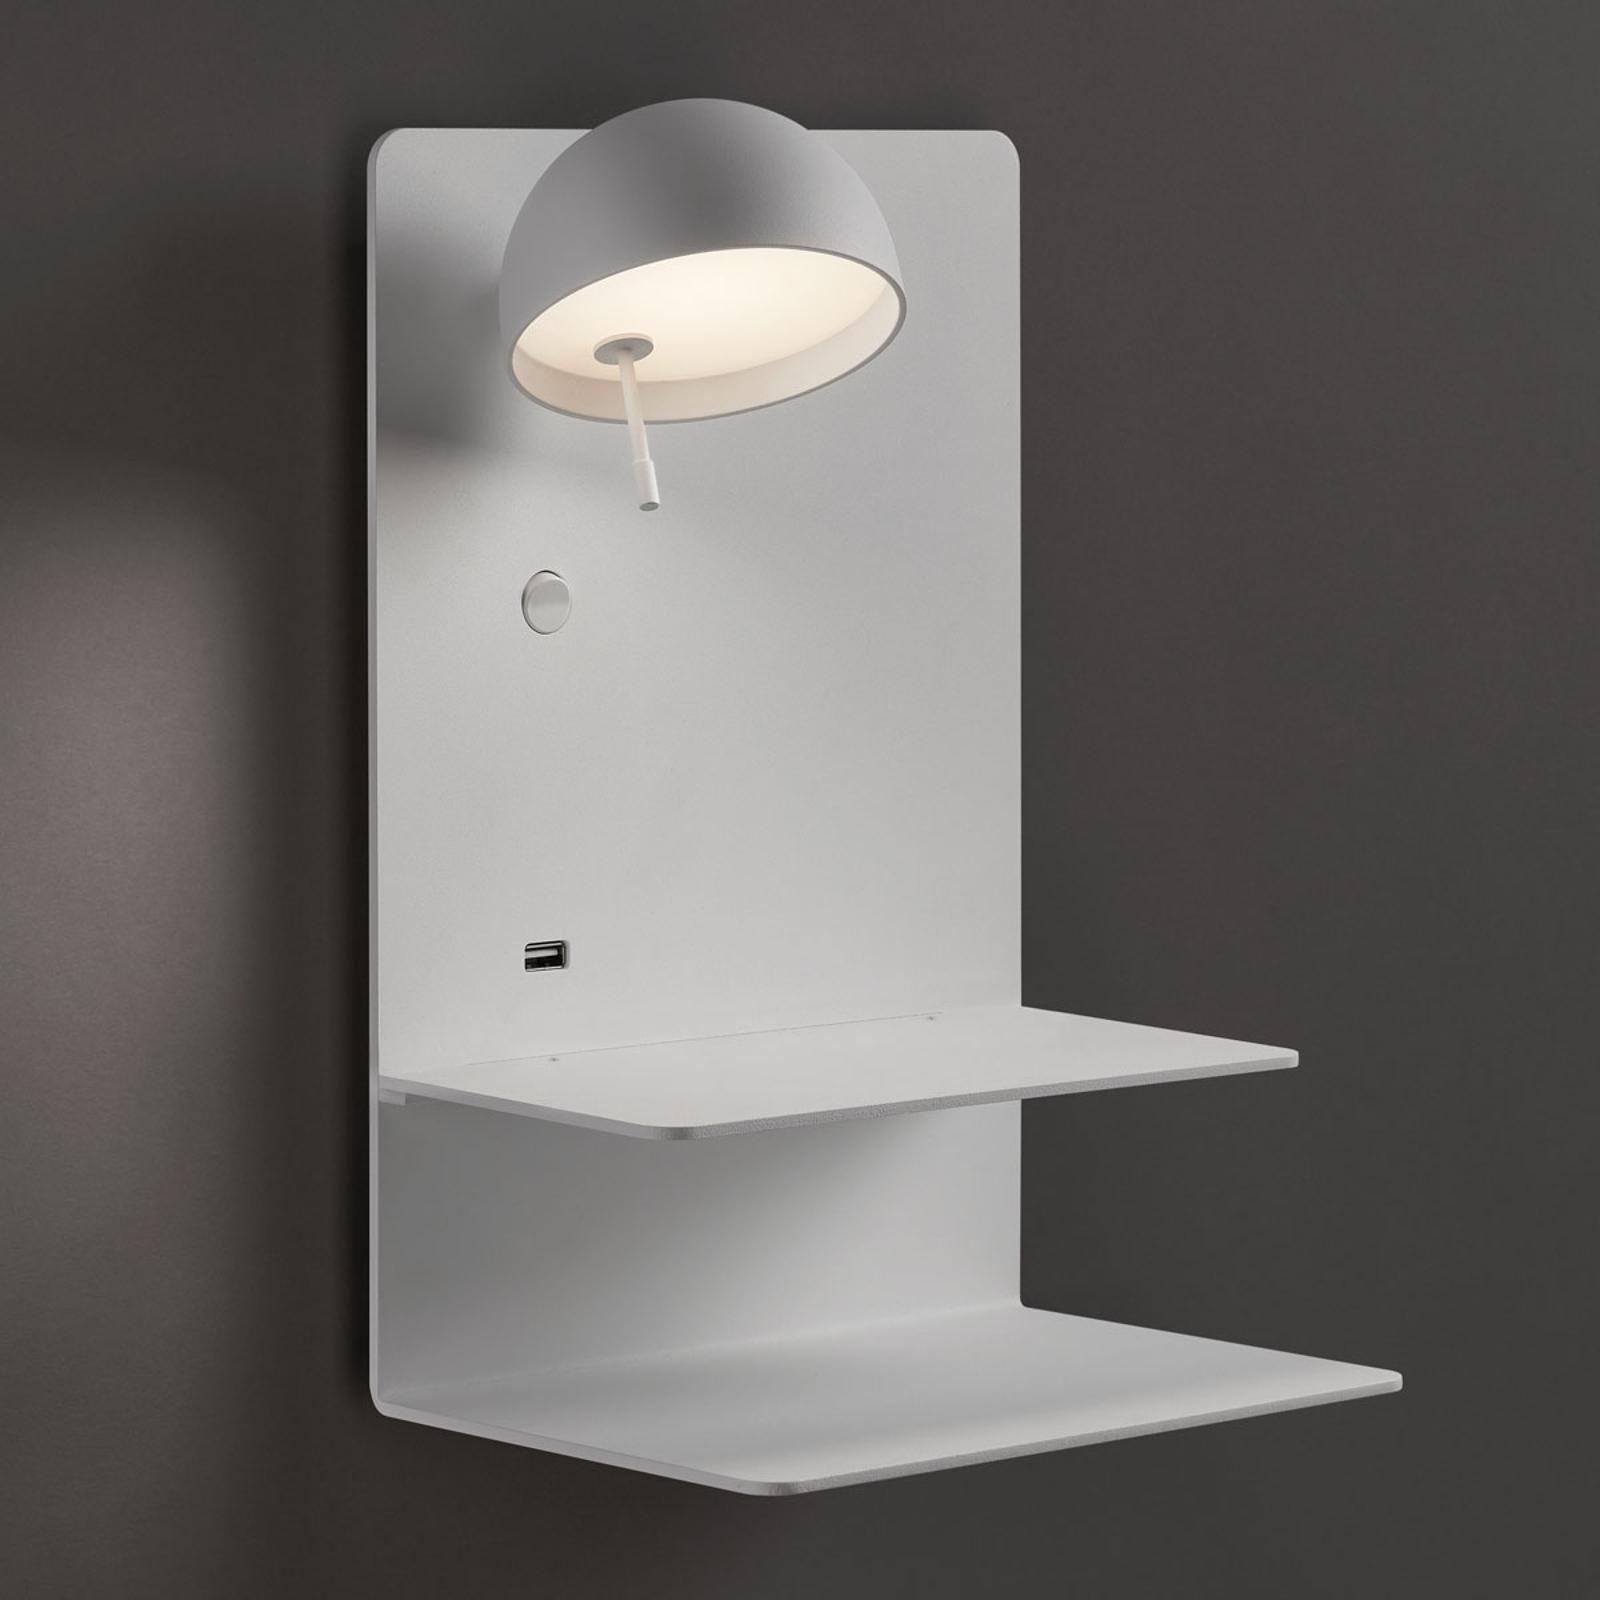 Bover Beddy A/04 applique LED blanc spot gauche